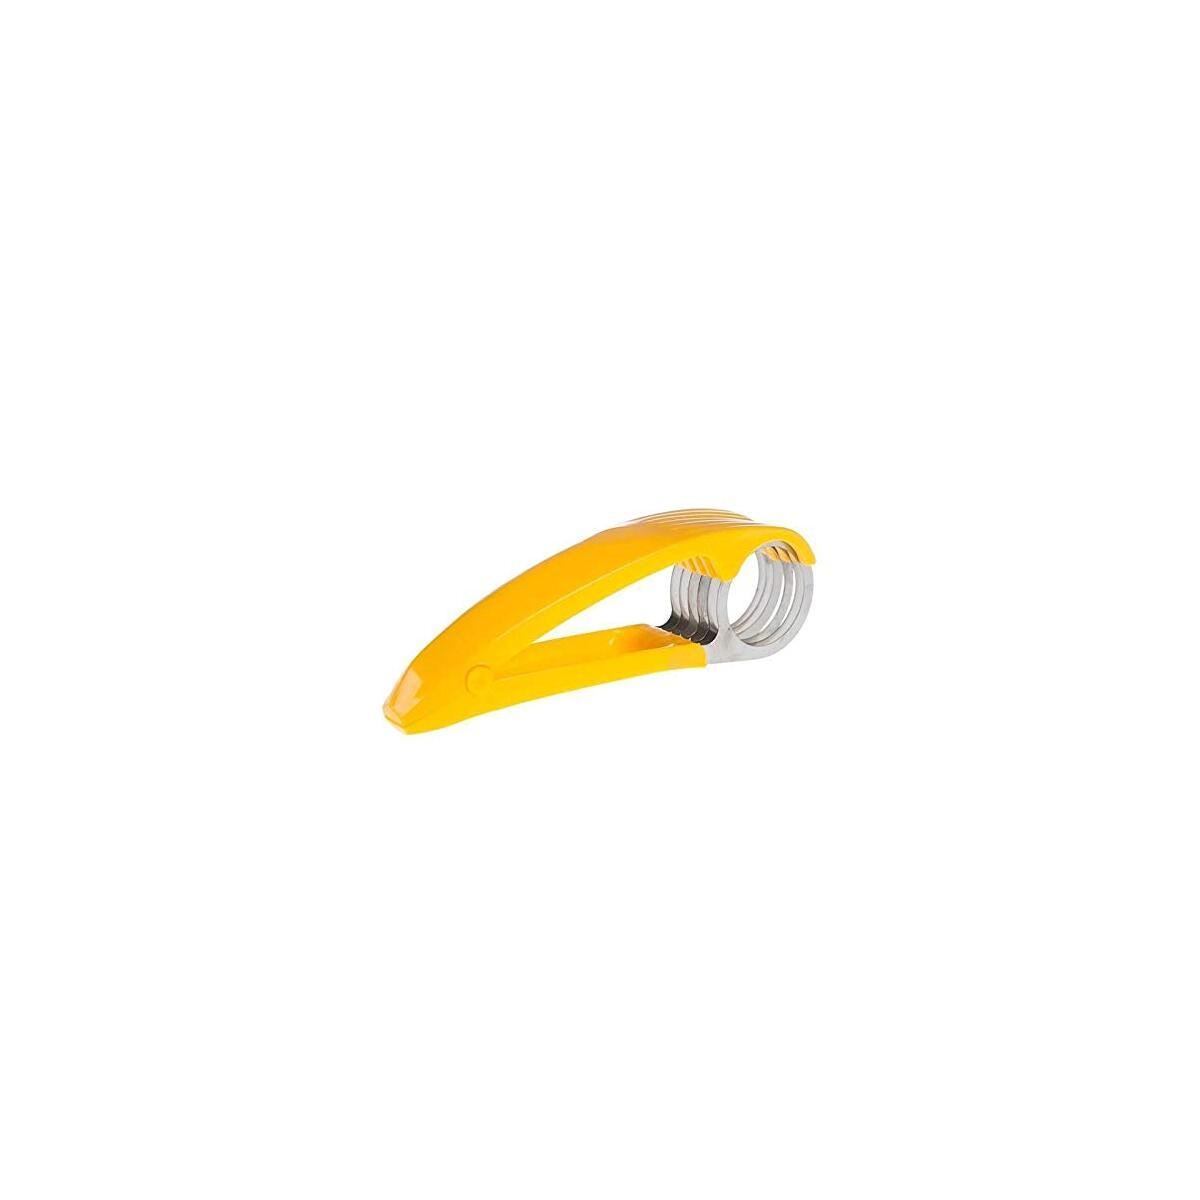 Banana Slicer Stainless Steel for Kitchen Tools, ABS Fruit Salad Peeler Cutter, Easy Handle Banana Cucumber Hotdog Tool Slicer